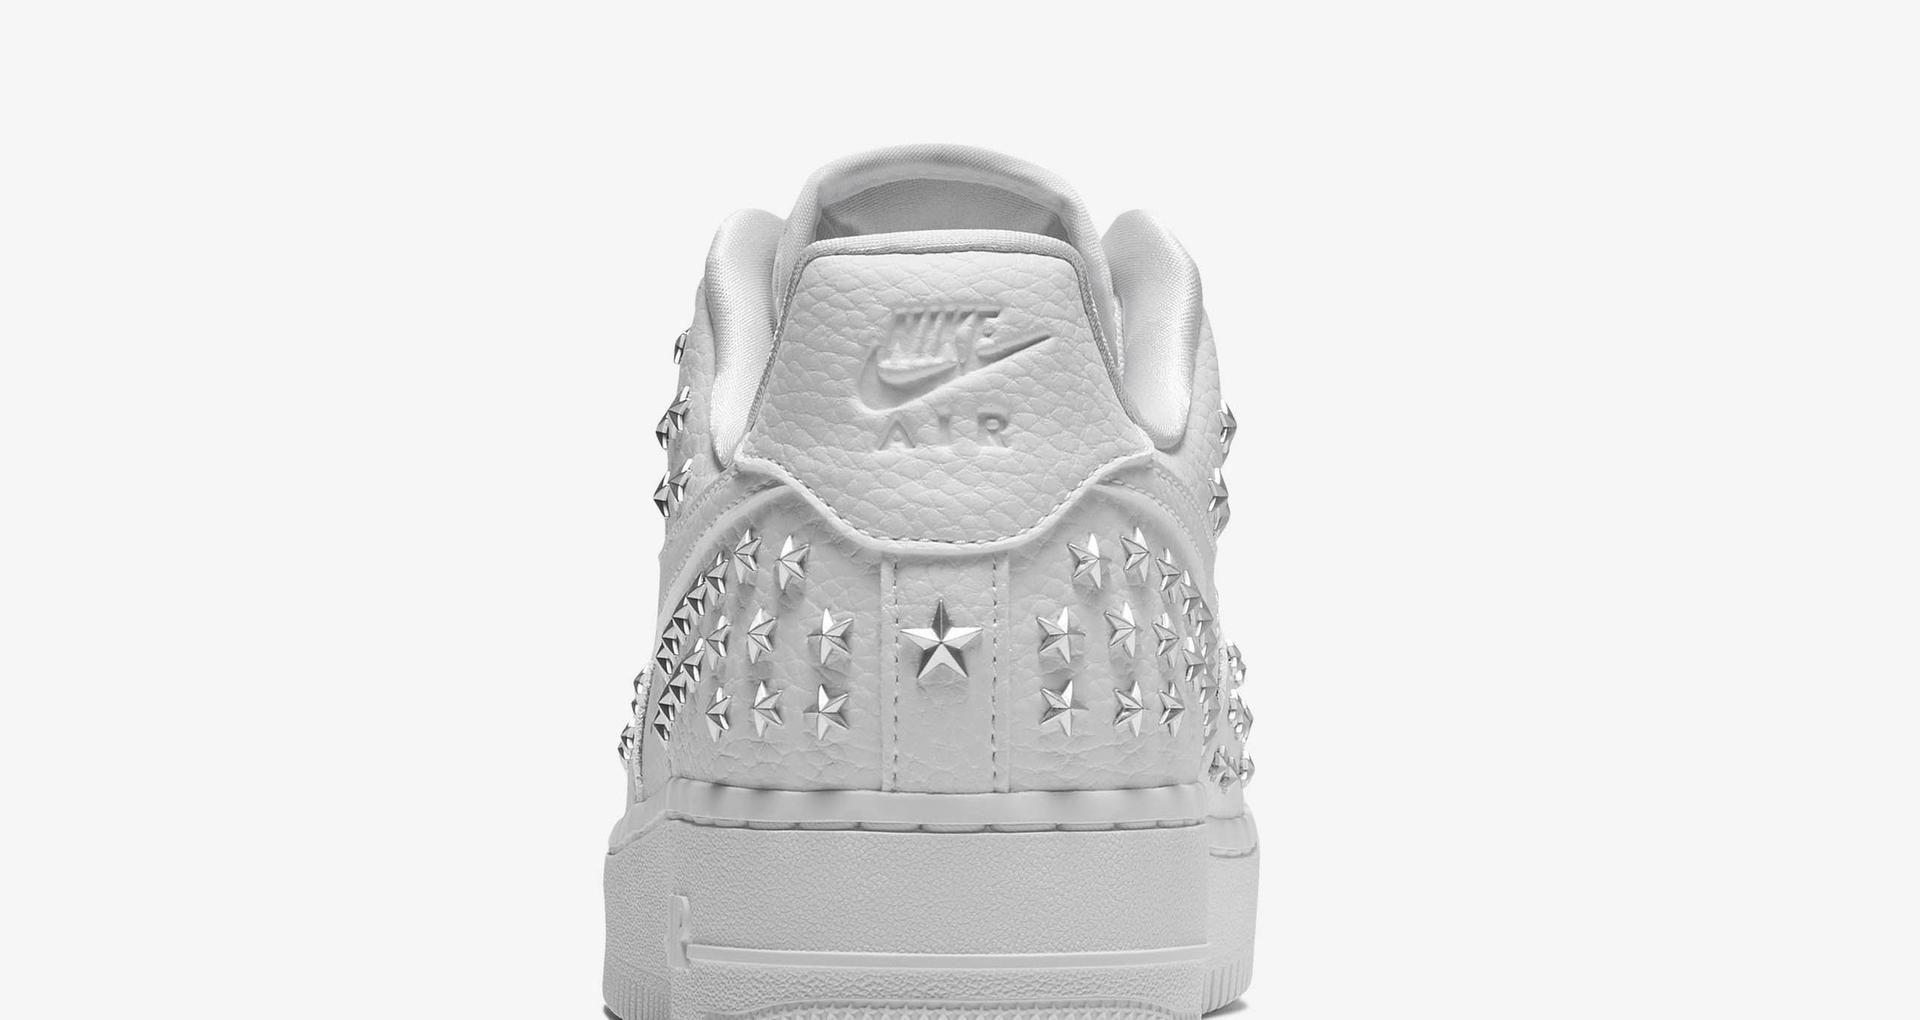 air force 1 xx studded